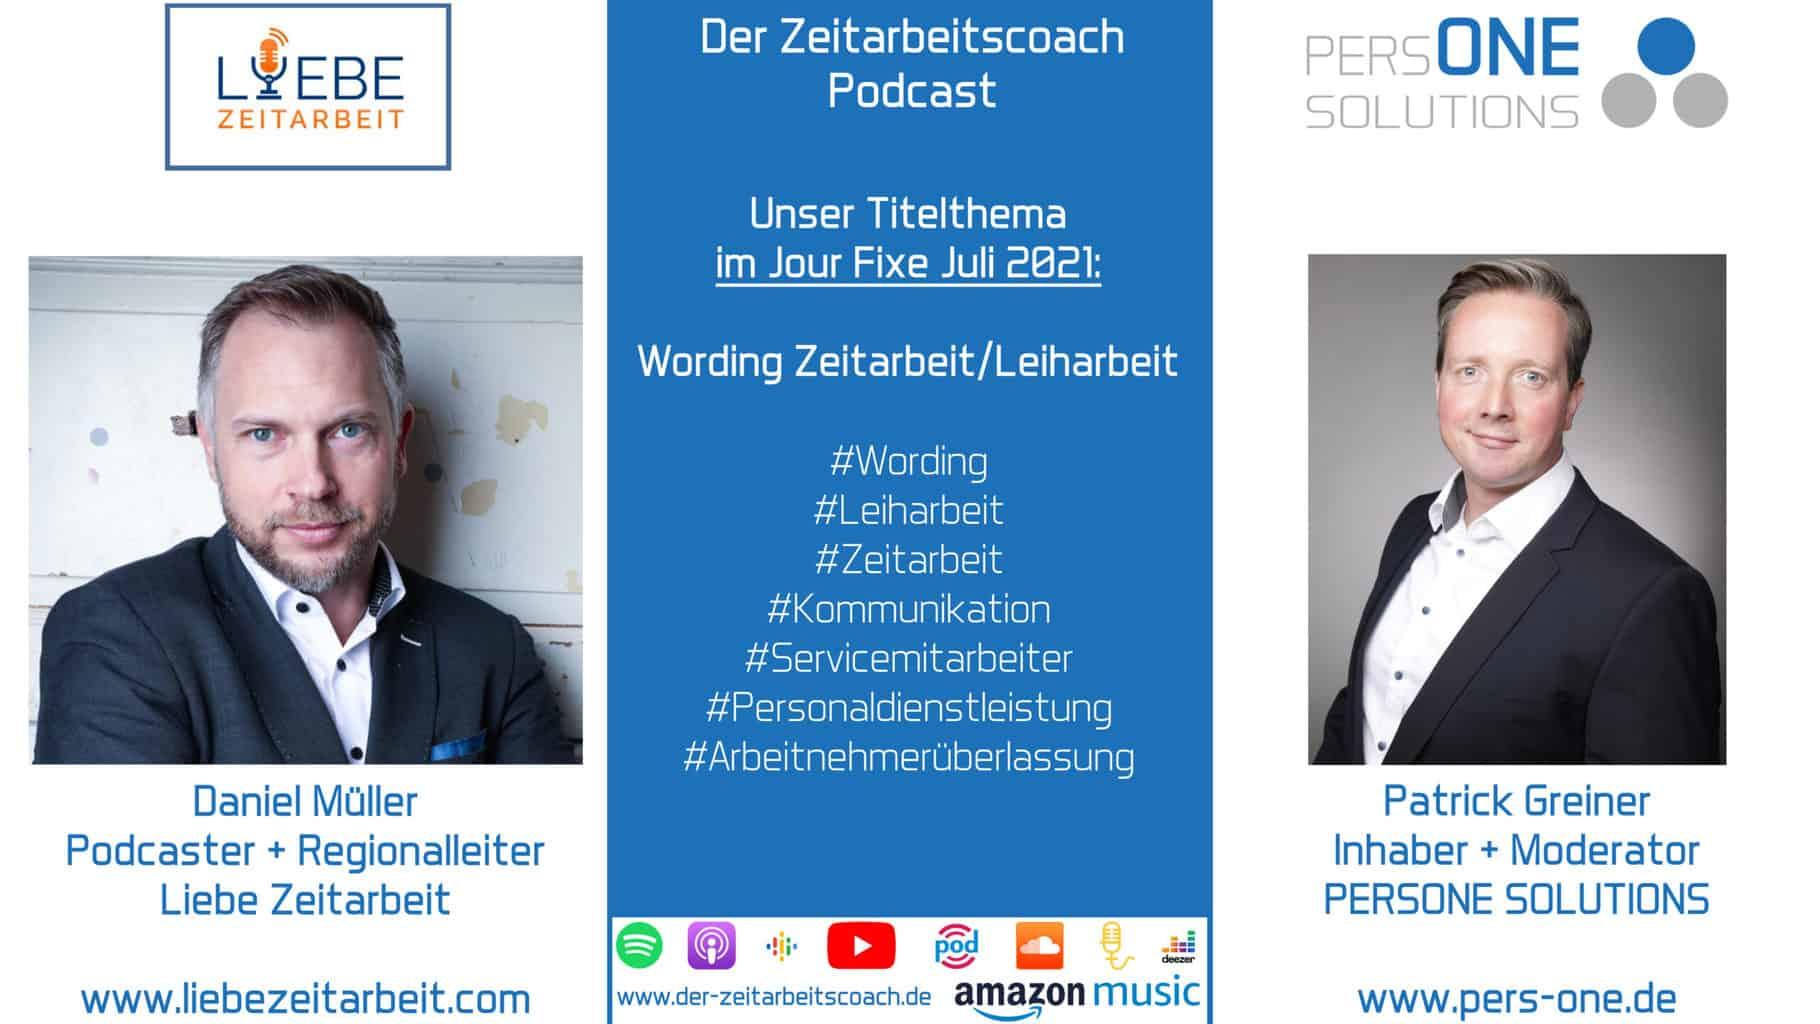 Müller, Daniel_Juli 2021 Jour Fixe_Podcast Grafik-Interview_Zeitarbeitscoach-Podcast